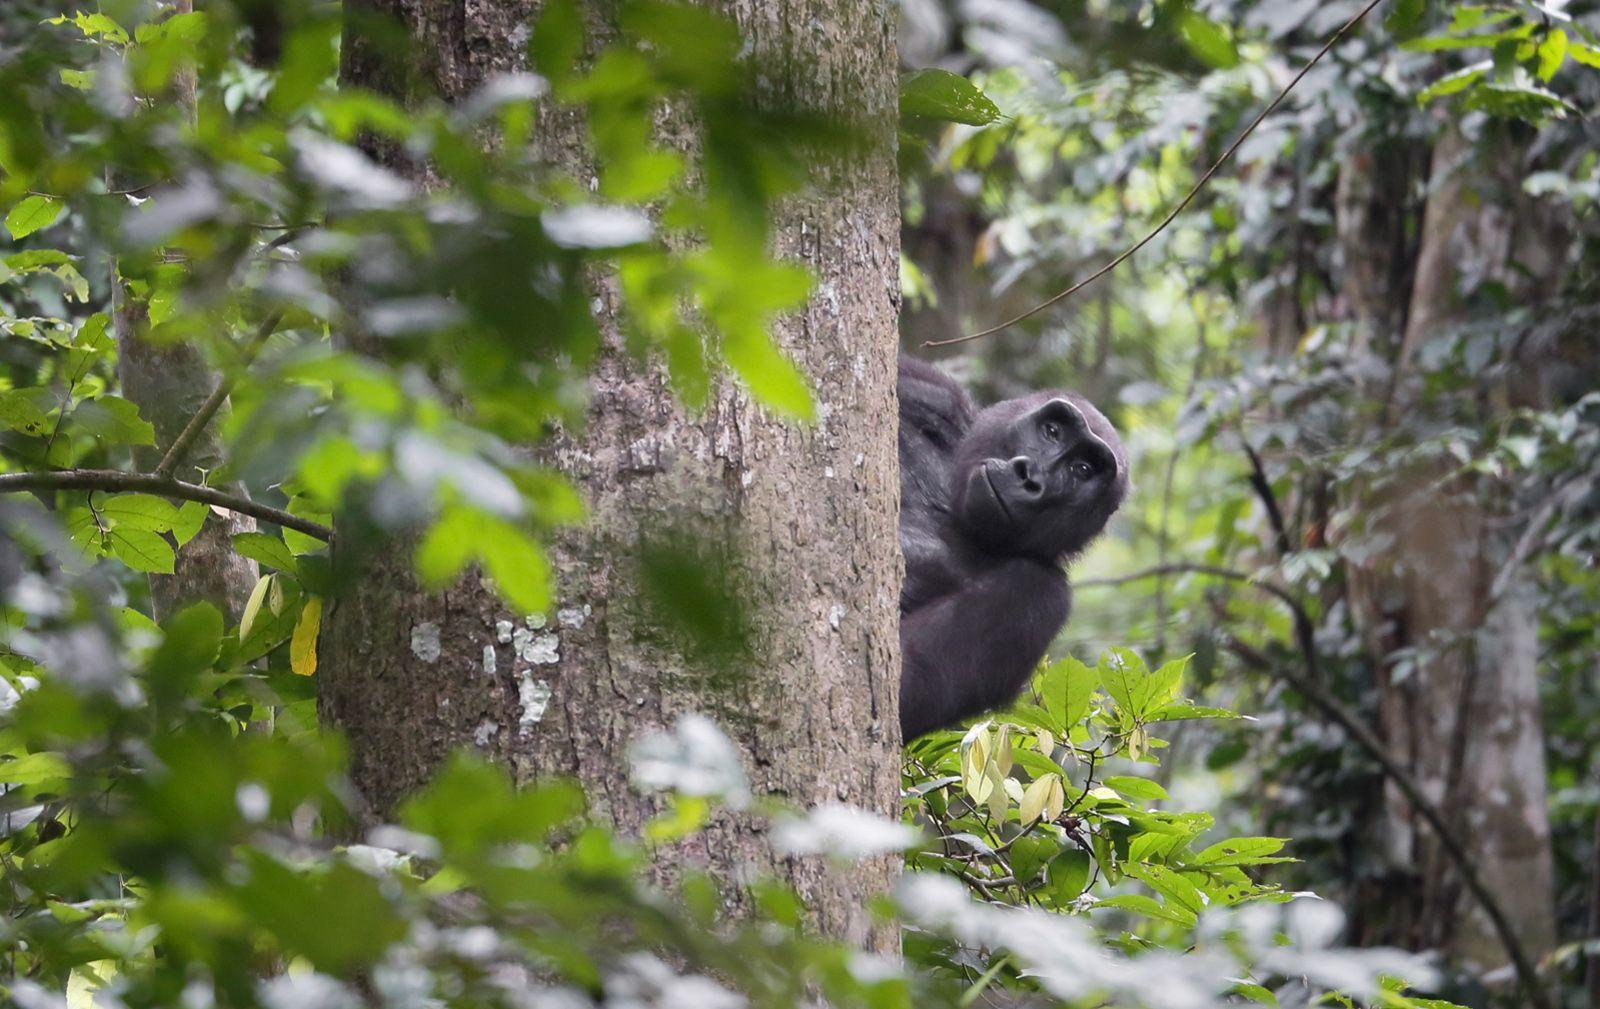 Gorille, Gabon. Parc national Moukalaba-Doudouk